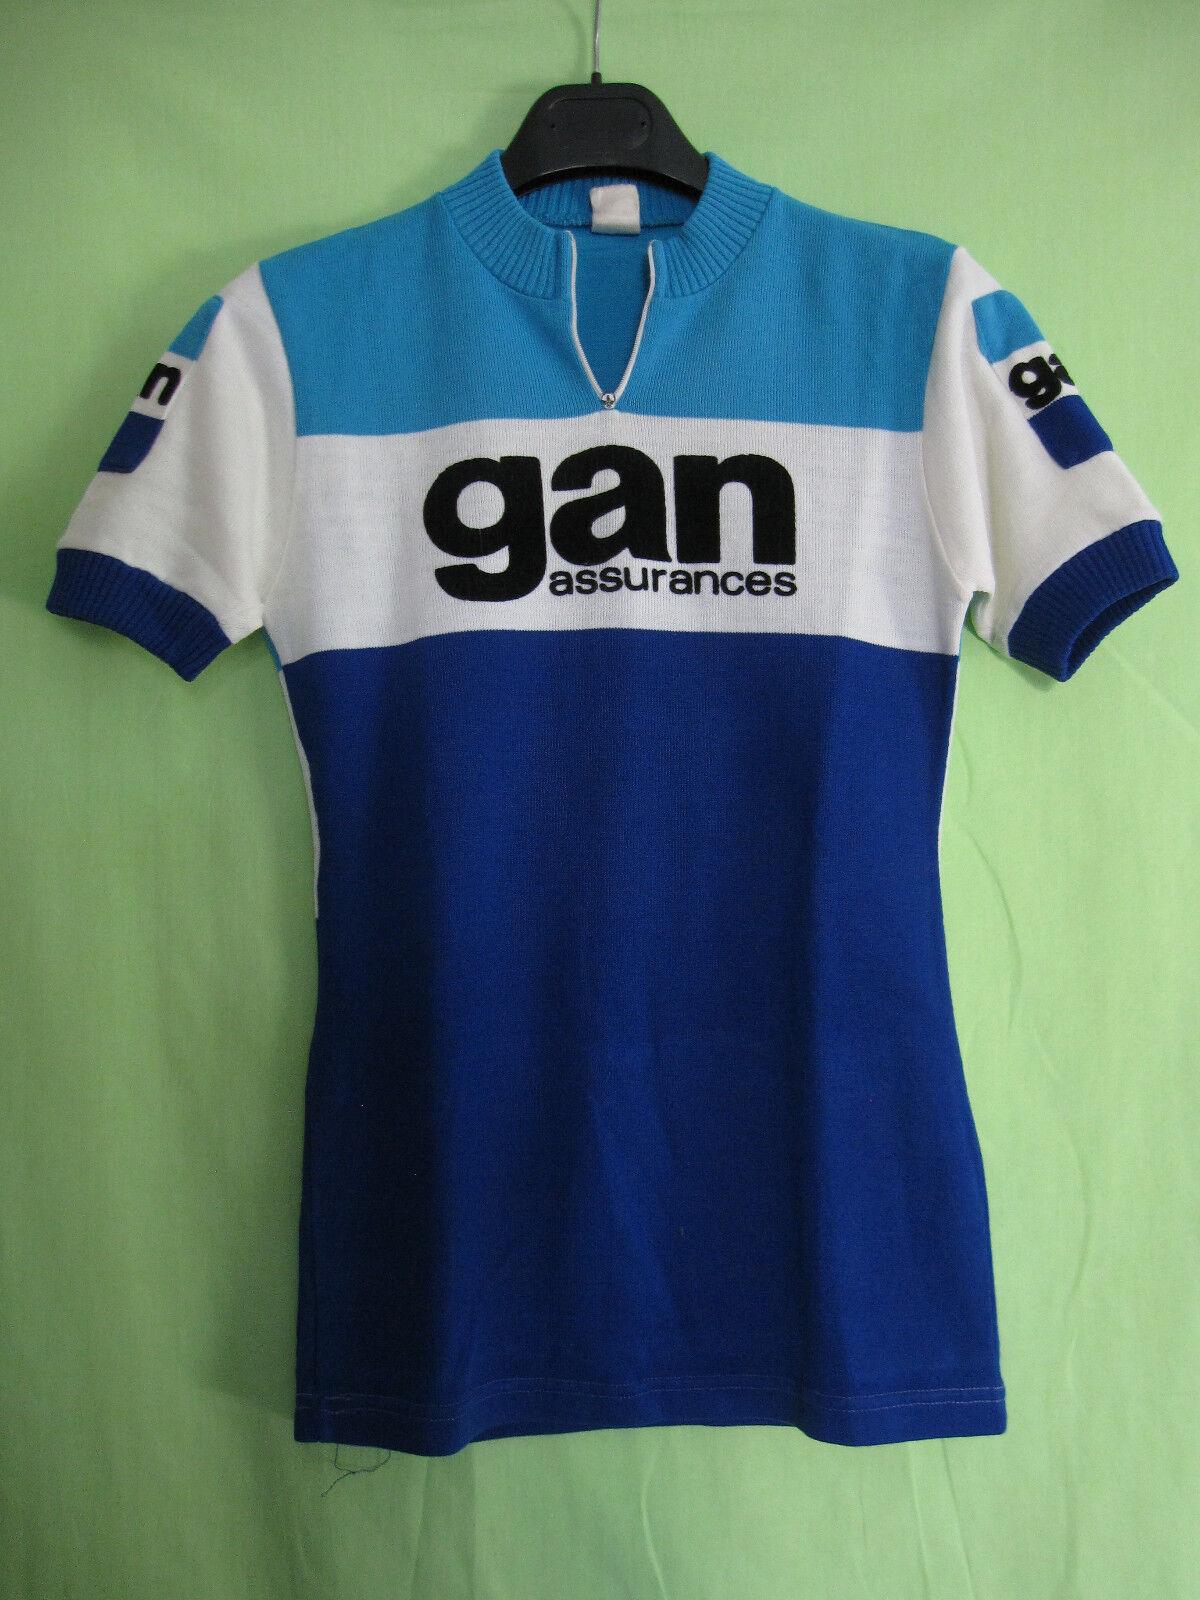 Maillot Cycliste vintage Gan Assurances Cycles Acrylique 70'S jersey - 1   XS